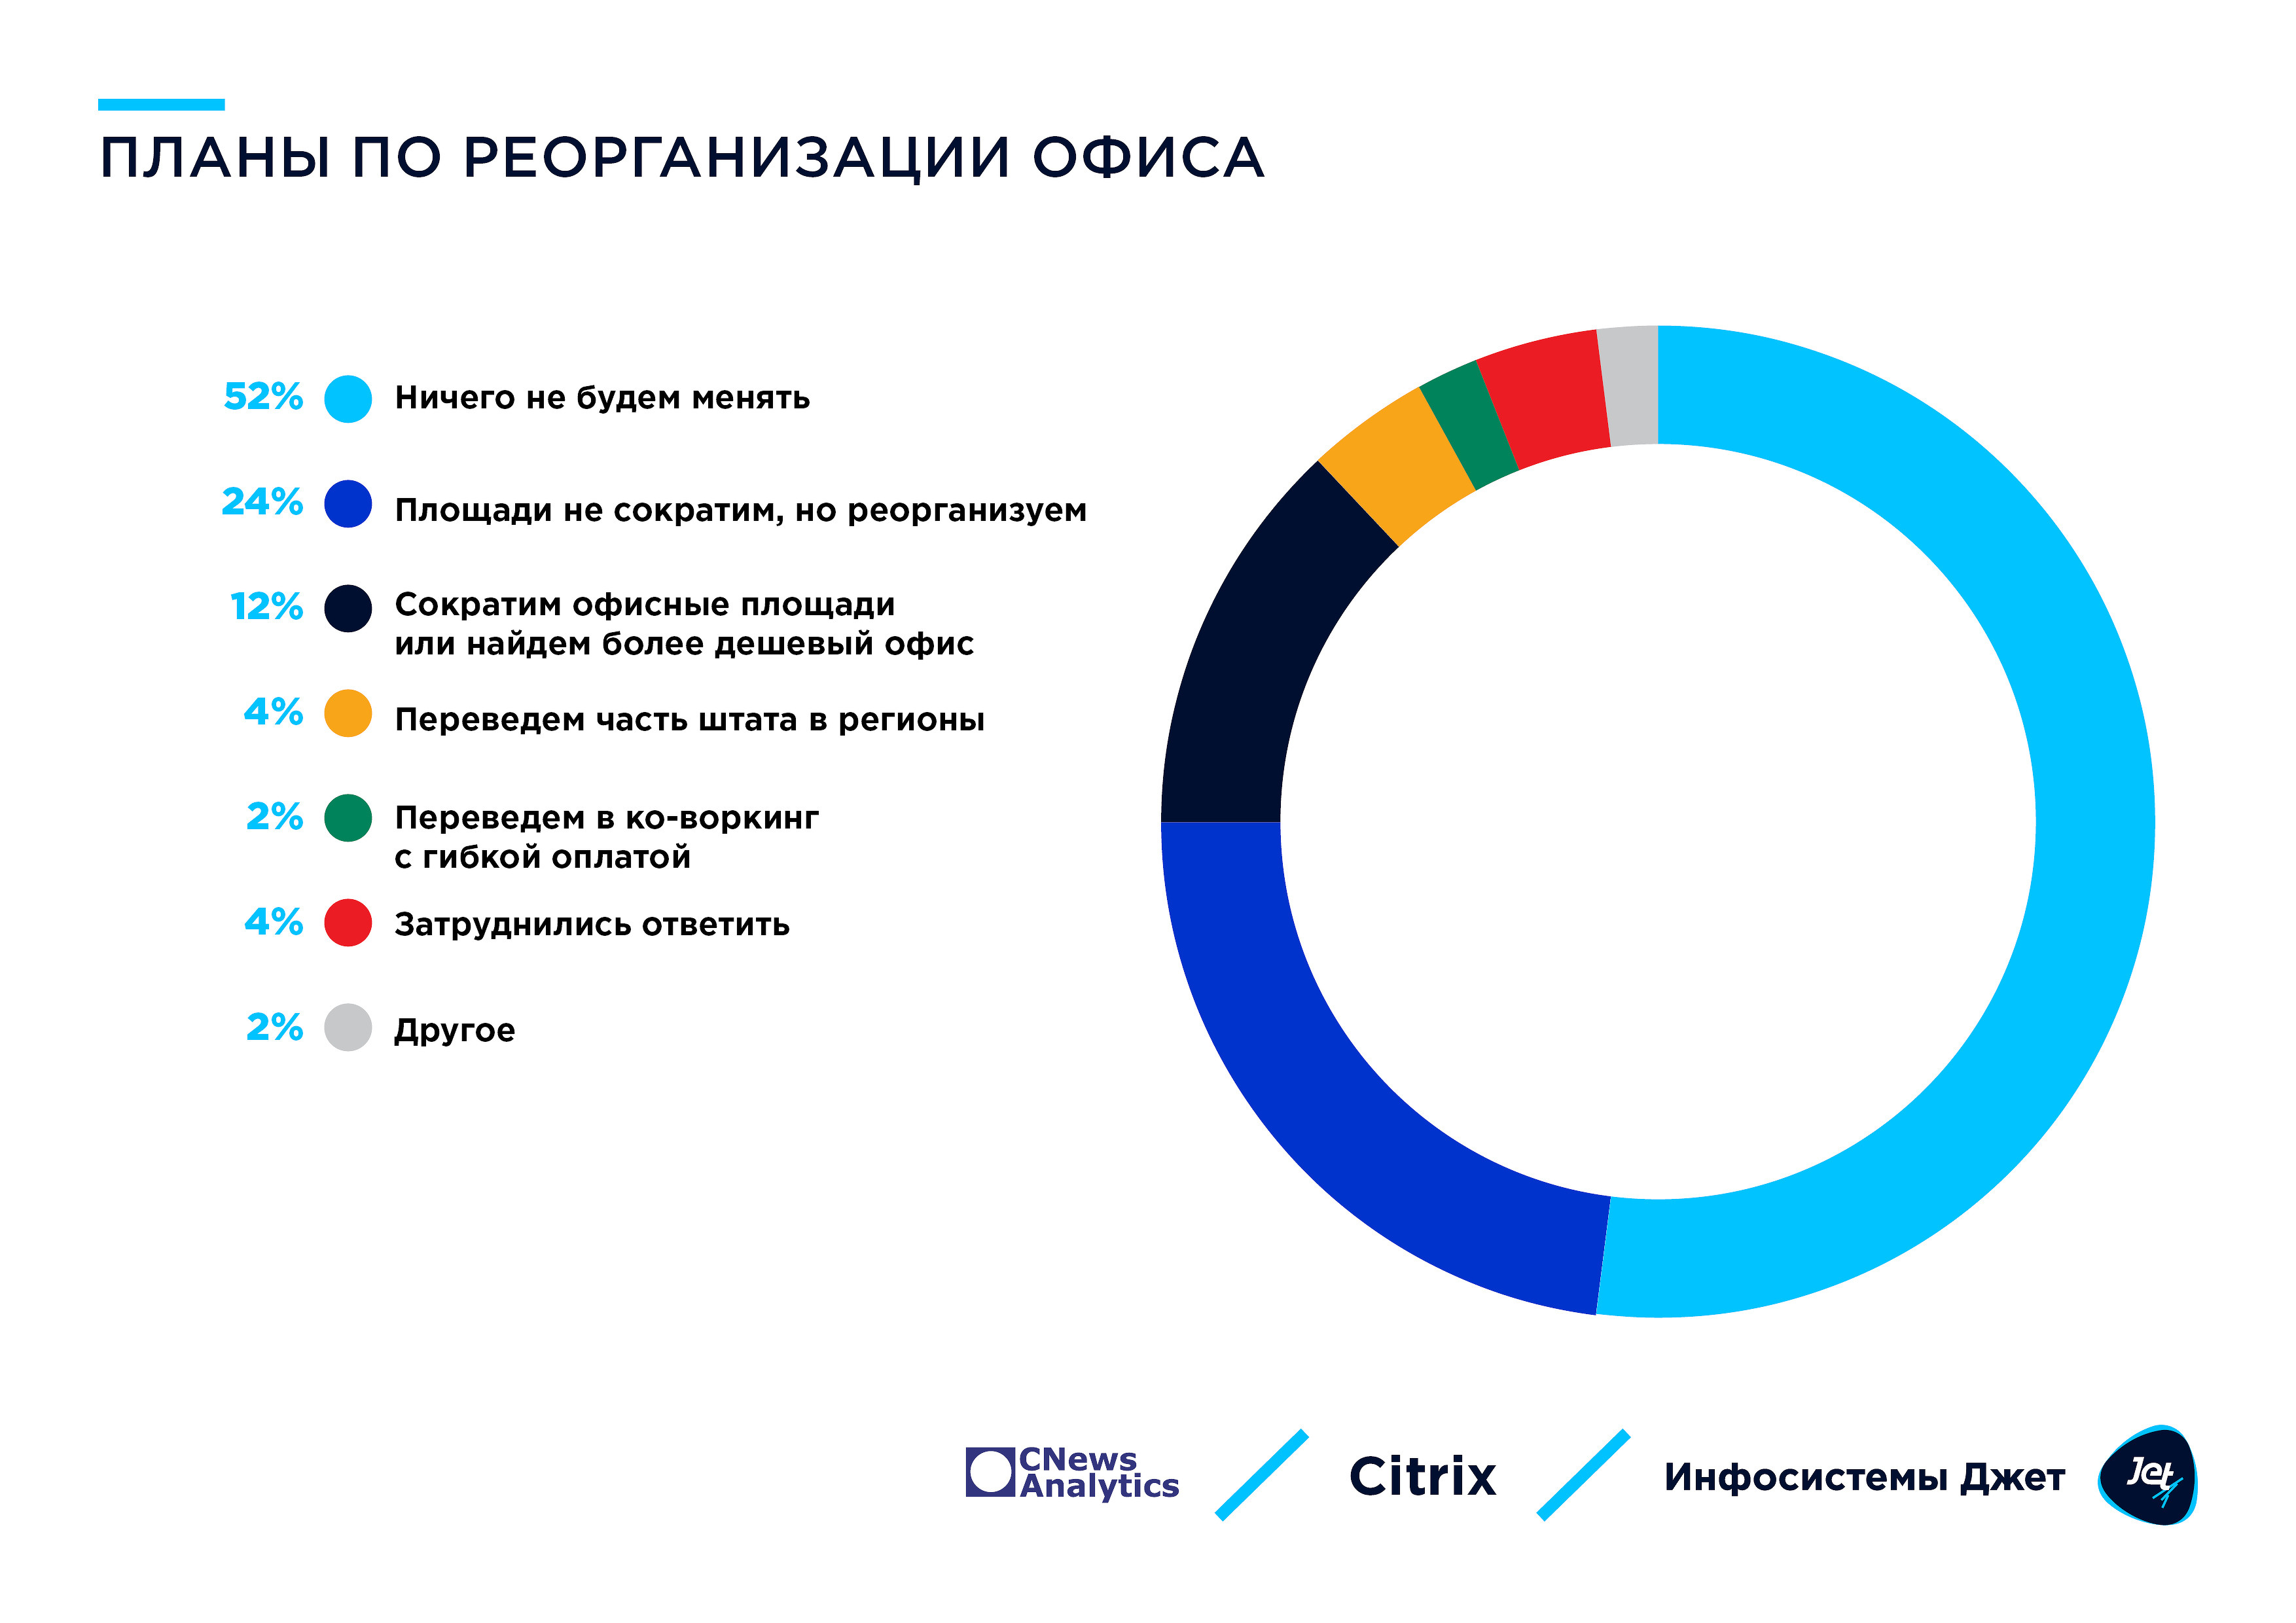 5_plany_po_reorganizatsii_ofisov.jpg